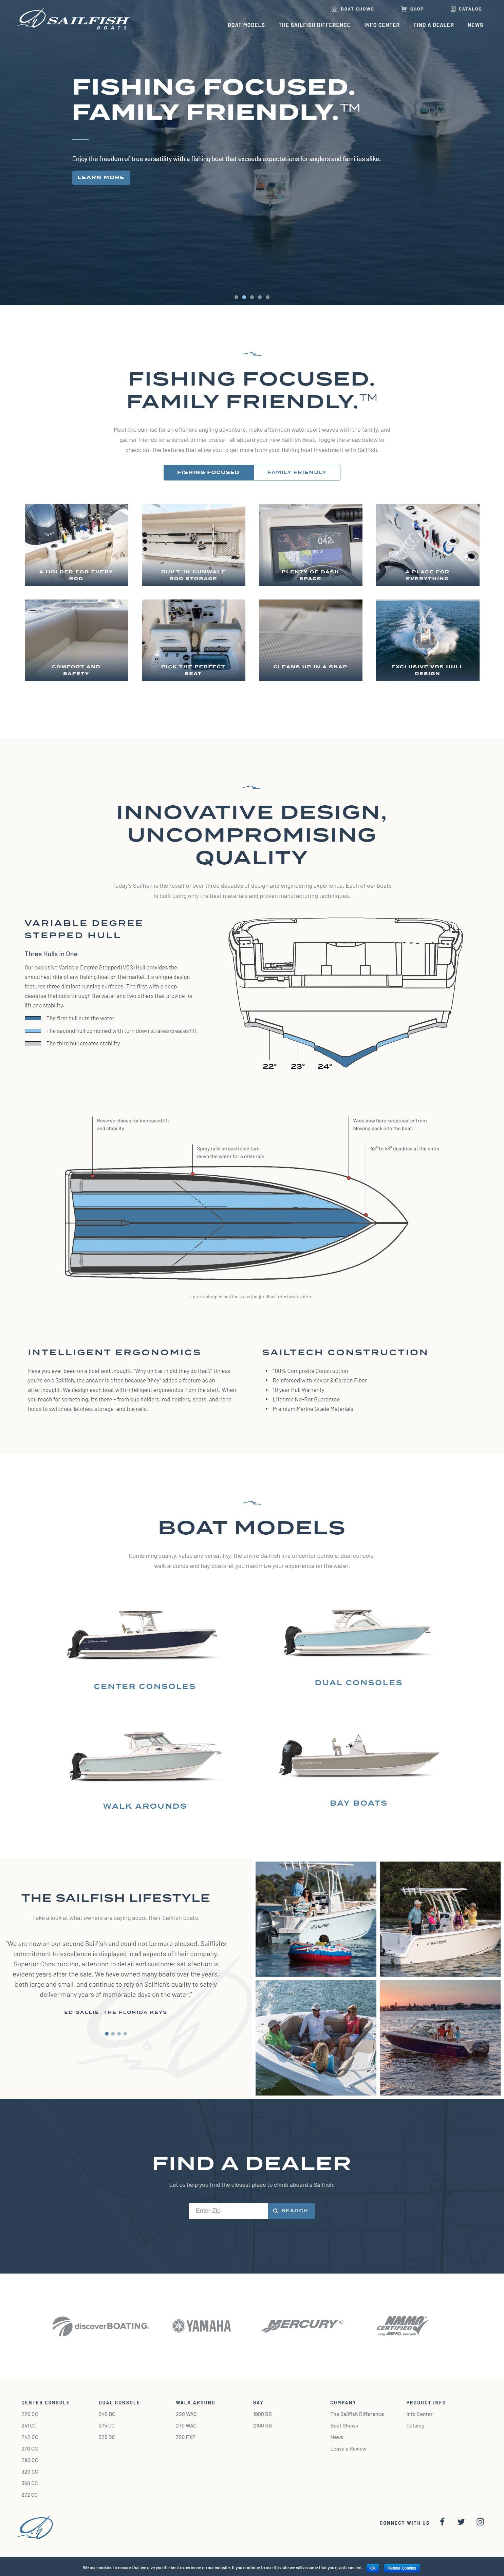 custom website design for Sailfish Boats